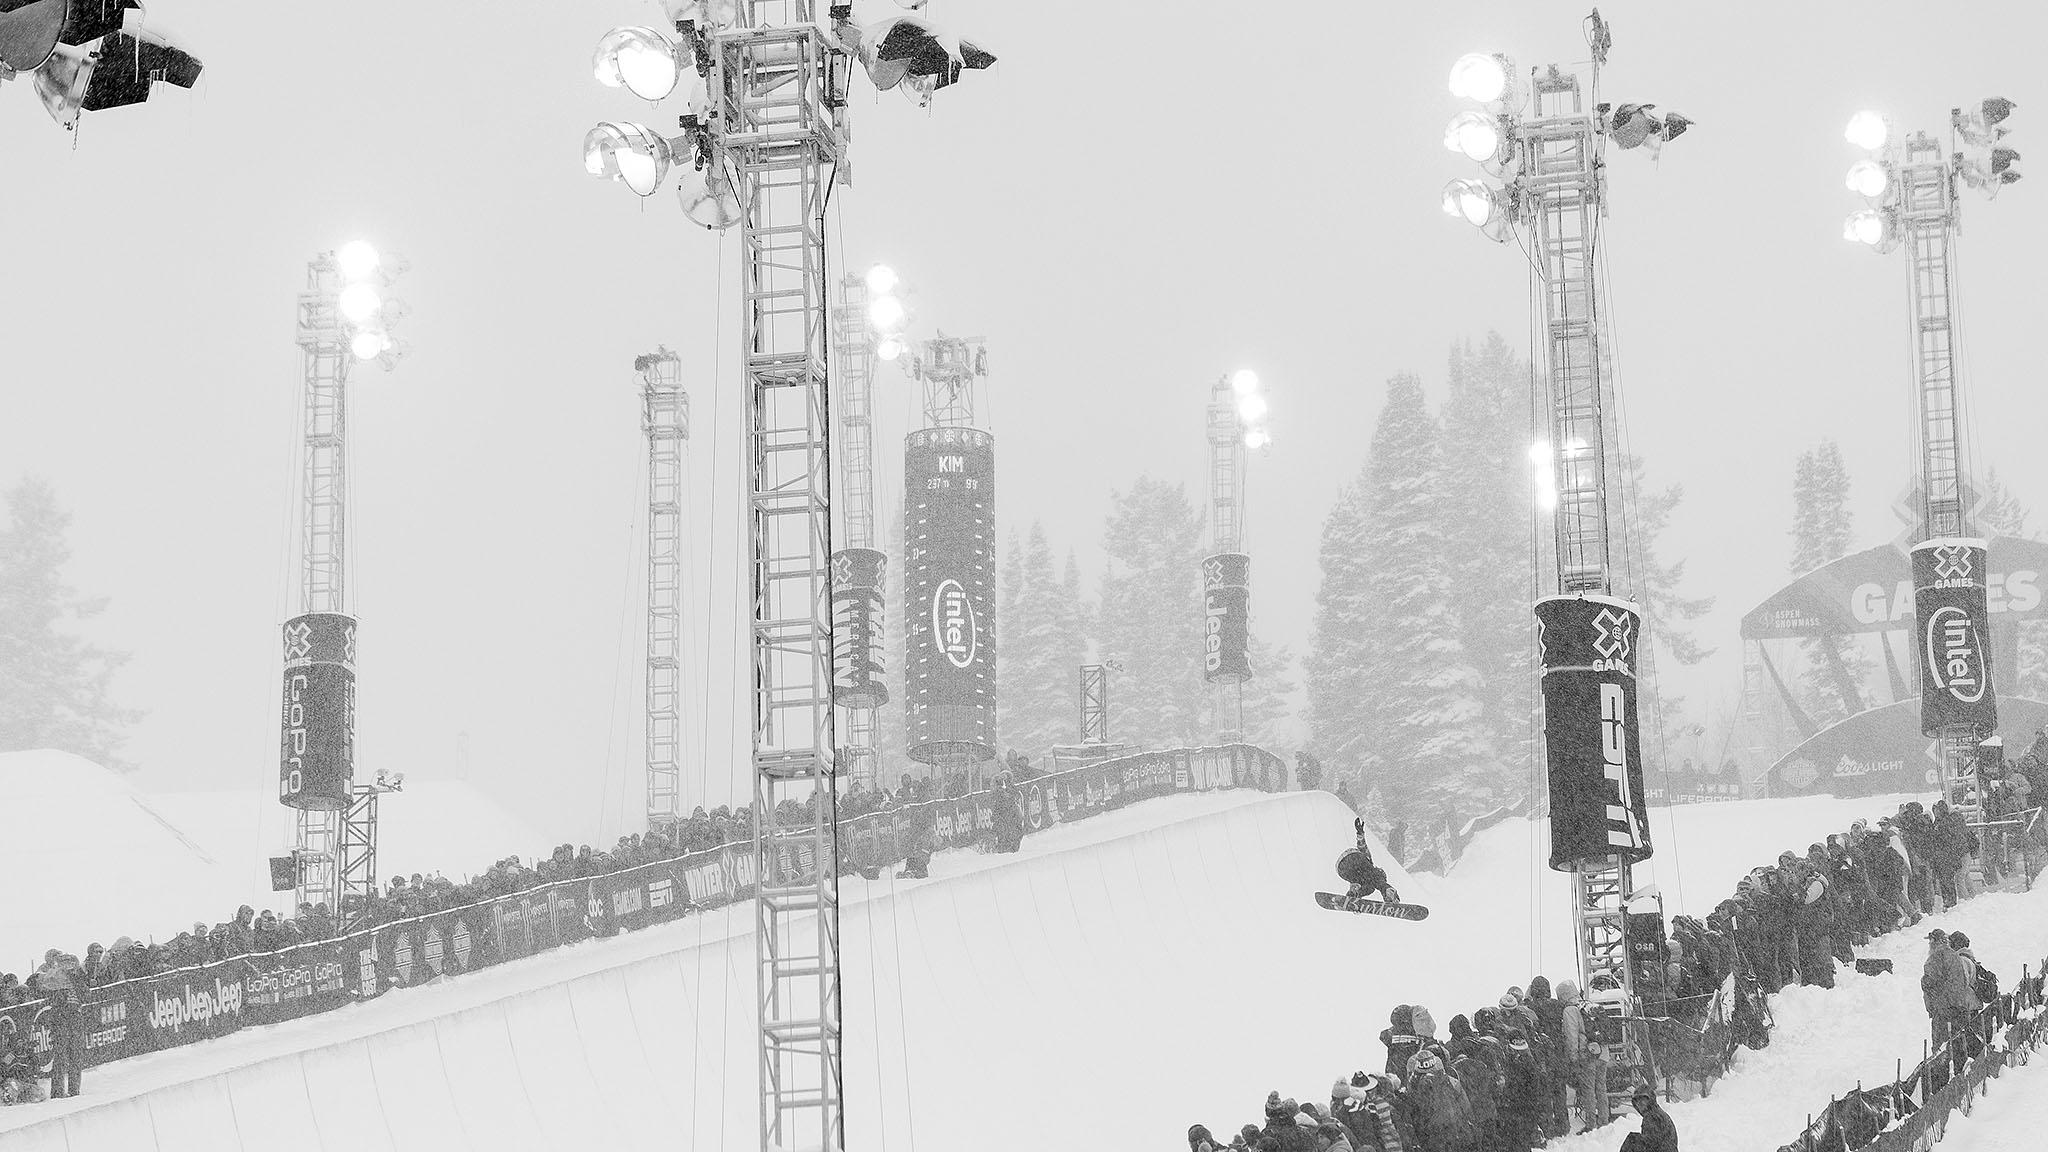 Chloe Kim wins Women's Snowboard SuperPipe